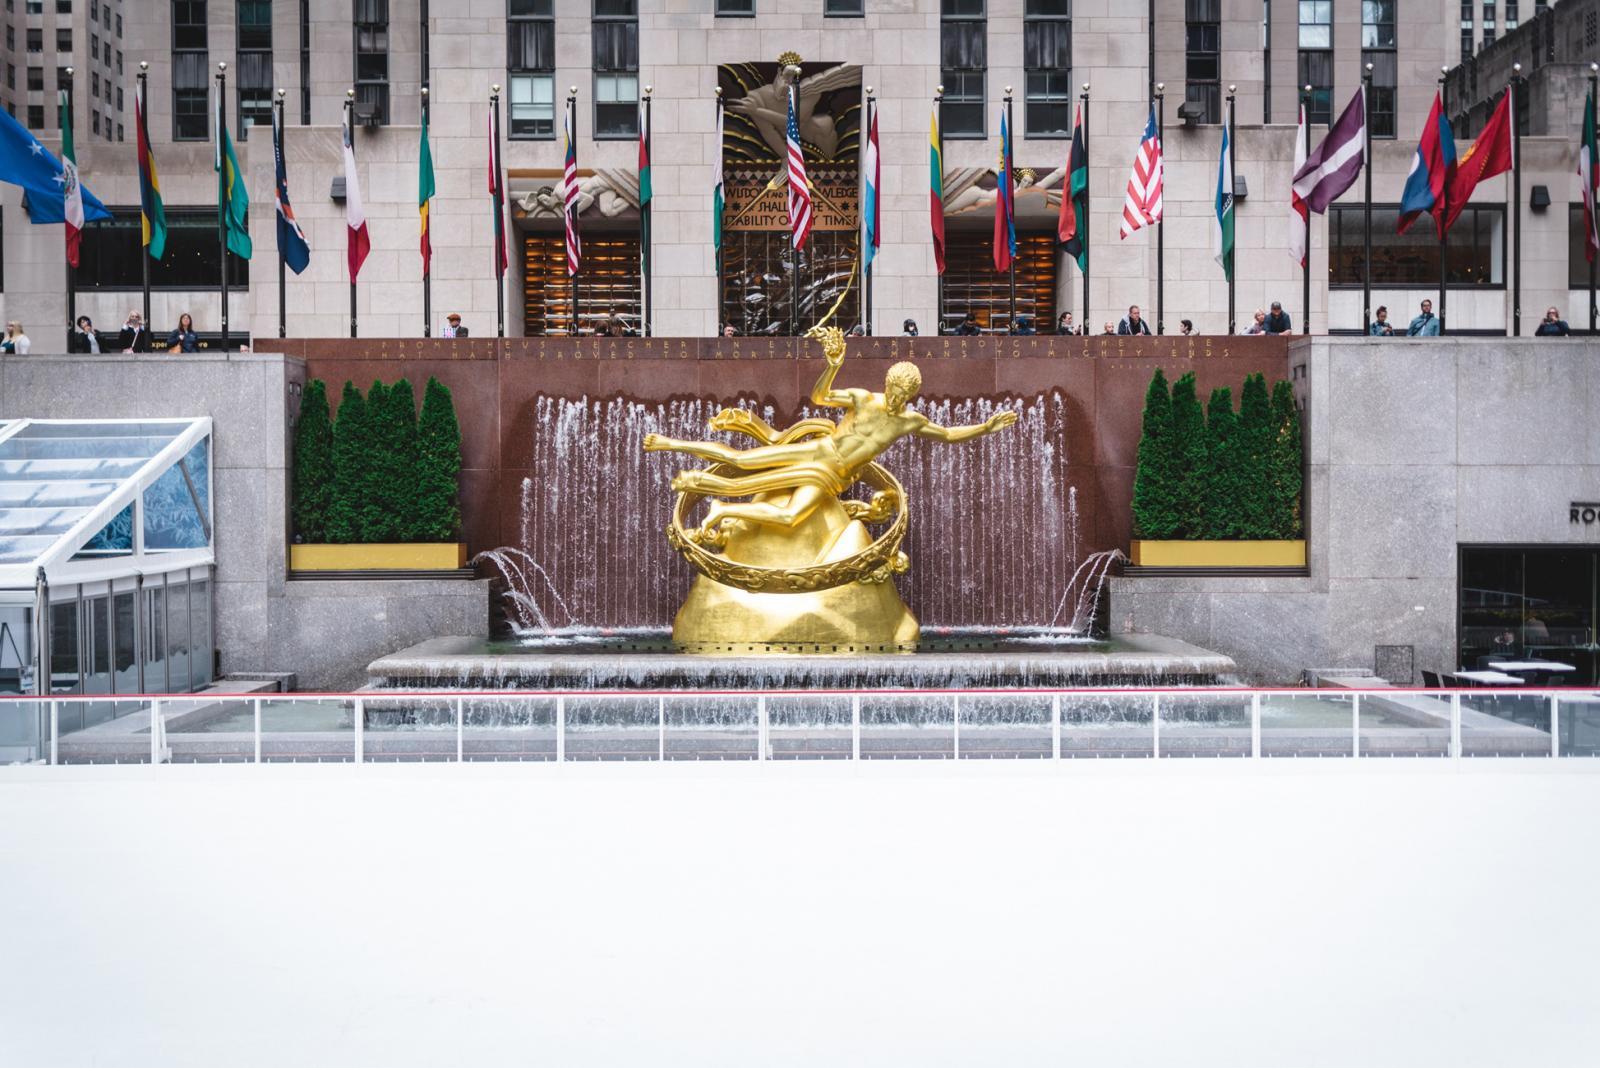 Ice RInks in New York